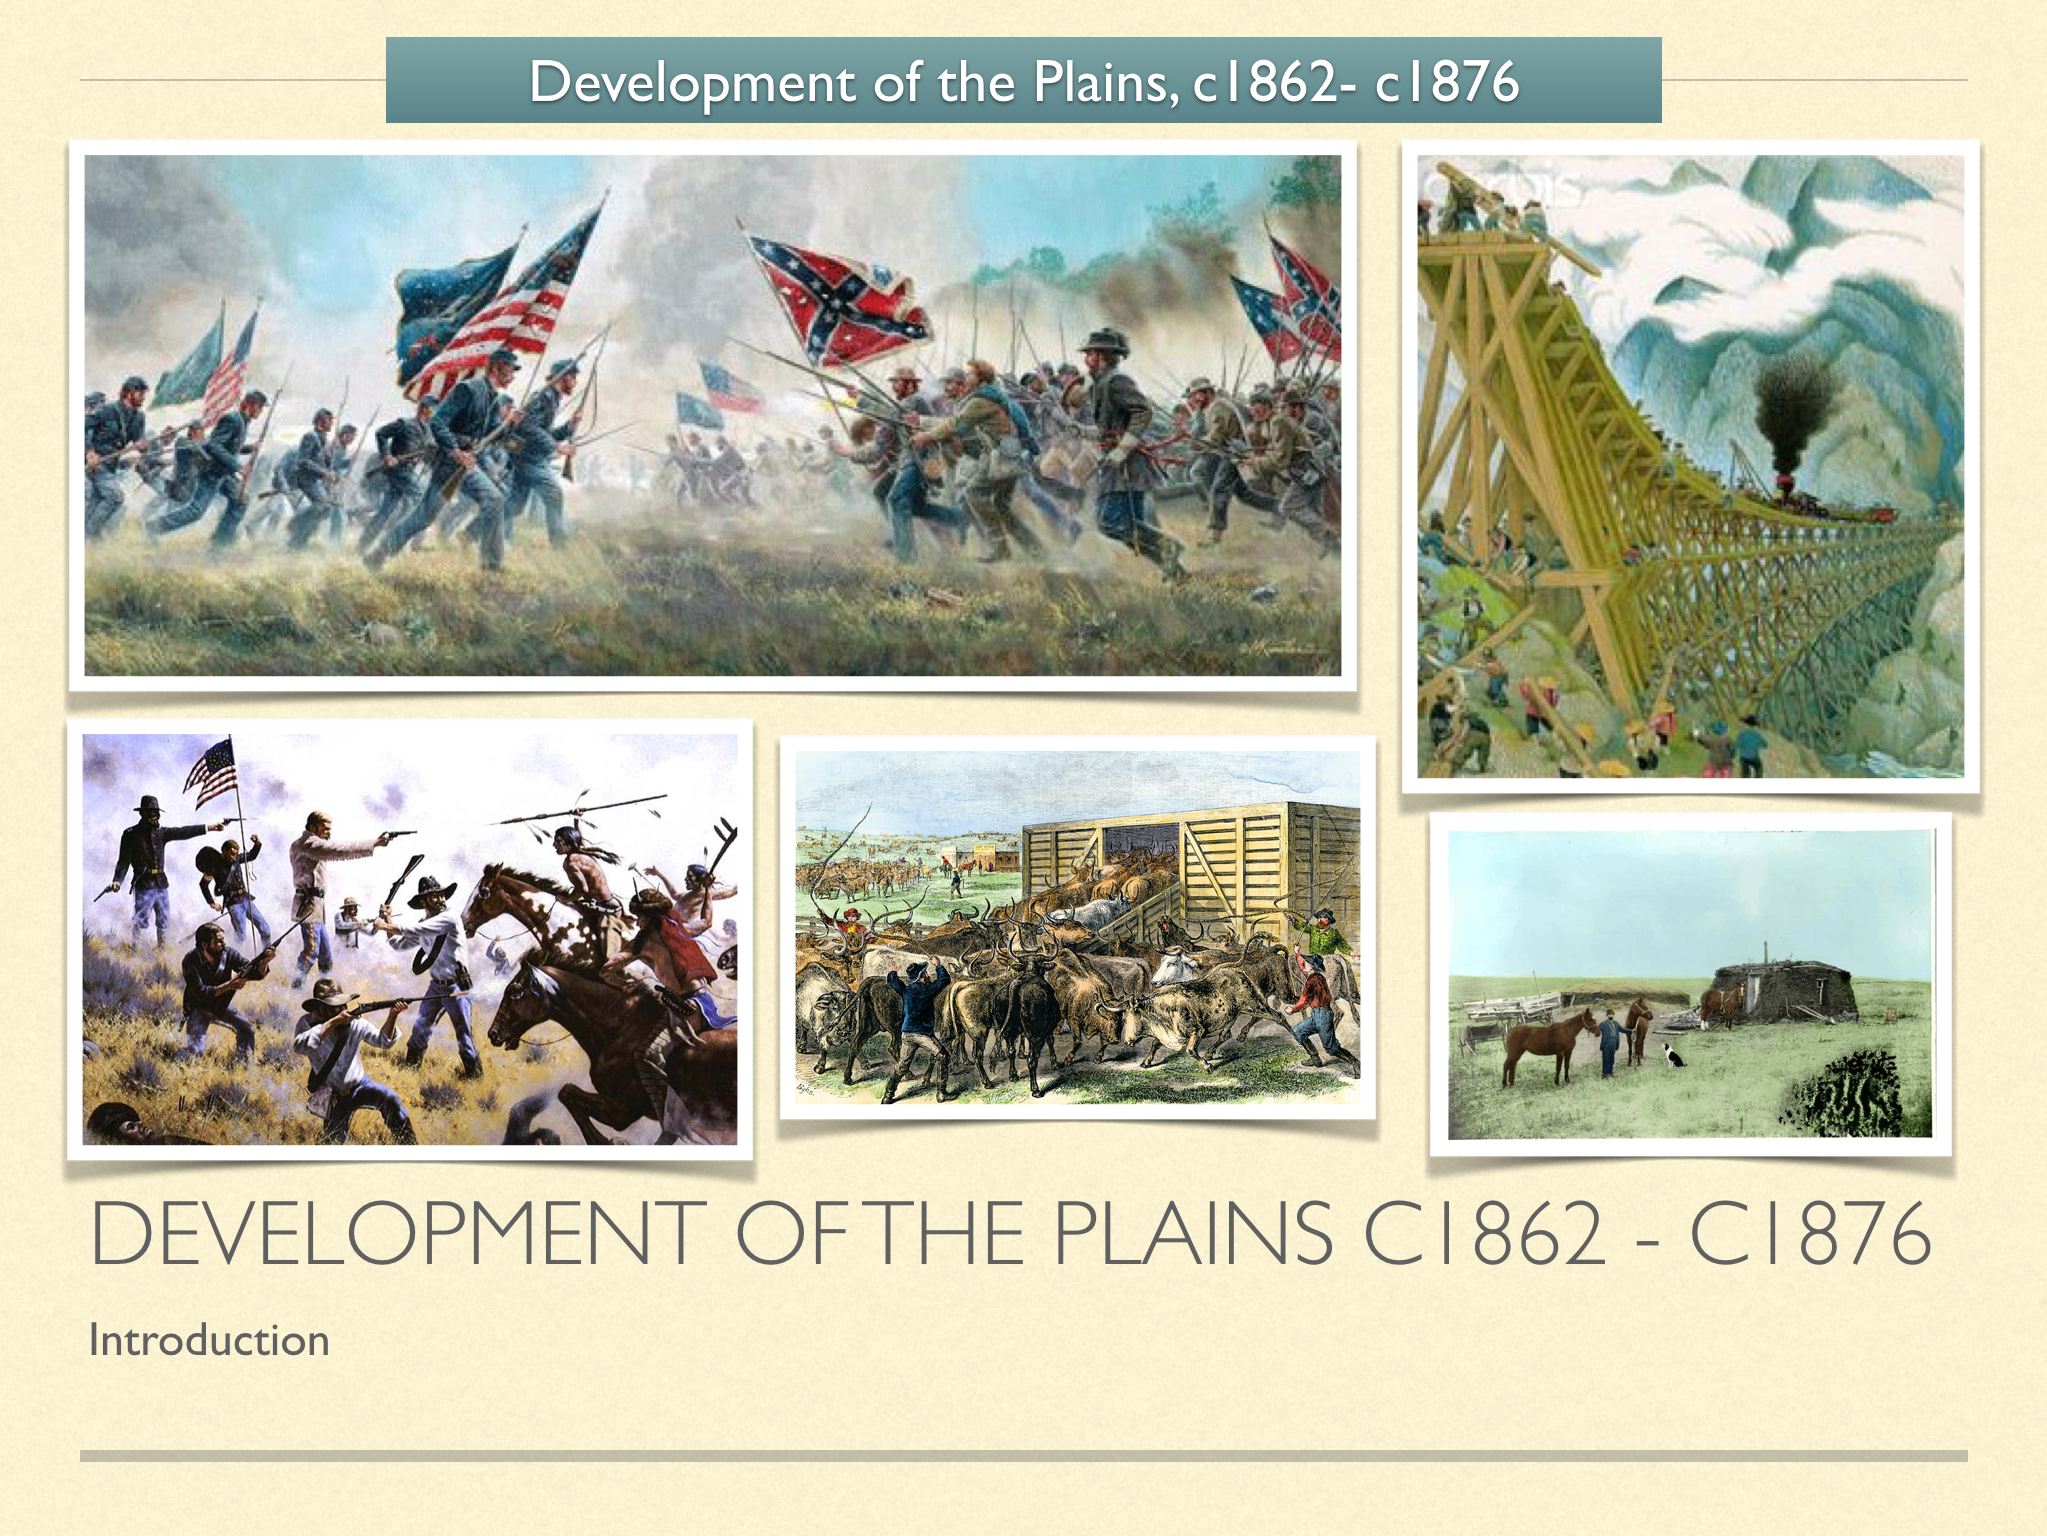 GCSE History of American West Unit 2 Development of the Plains